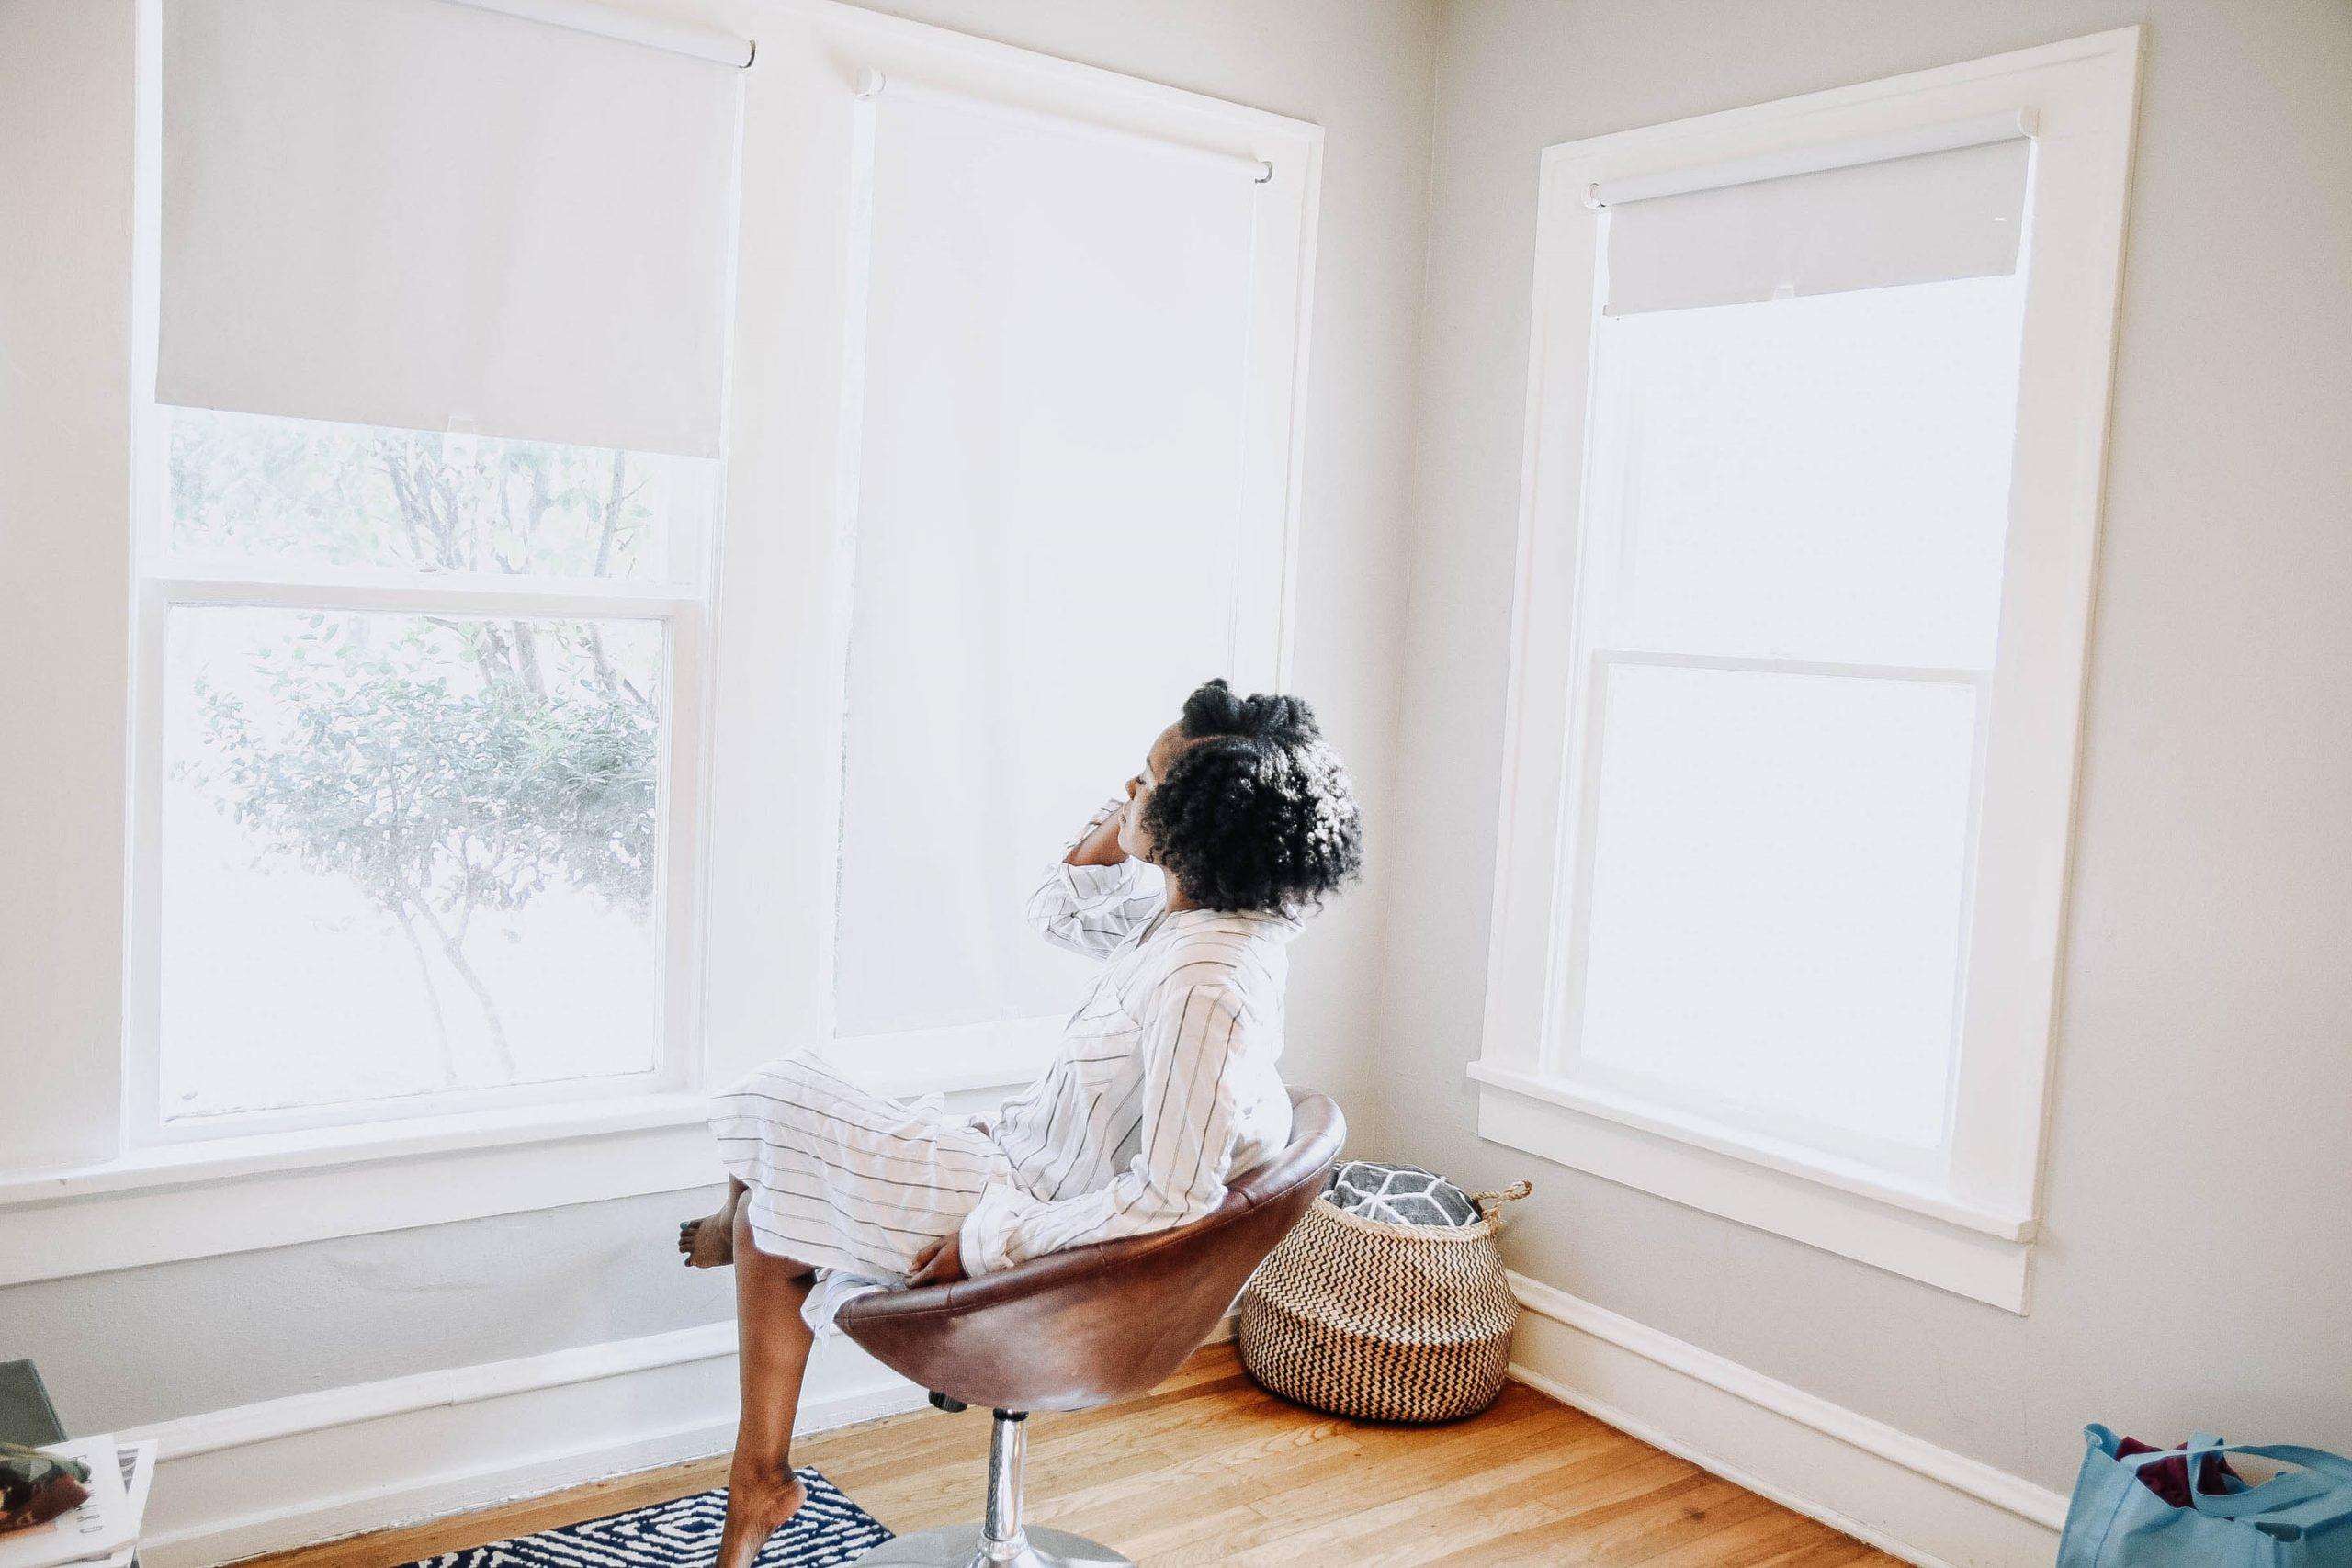 createherstock-2019-At-Home-Isha-Gaines-52-scaled